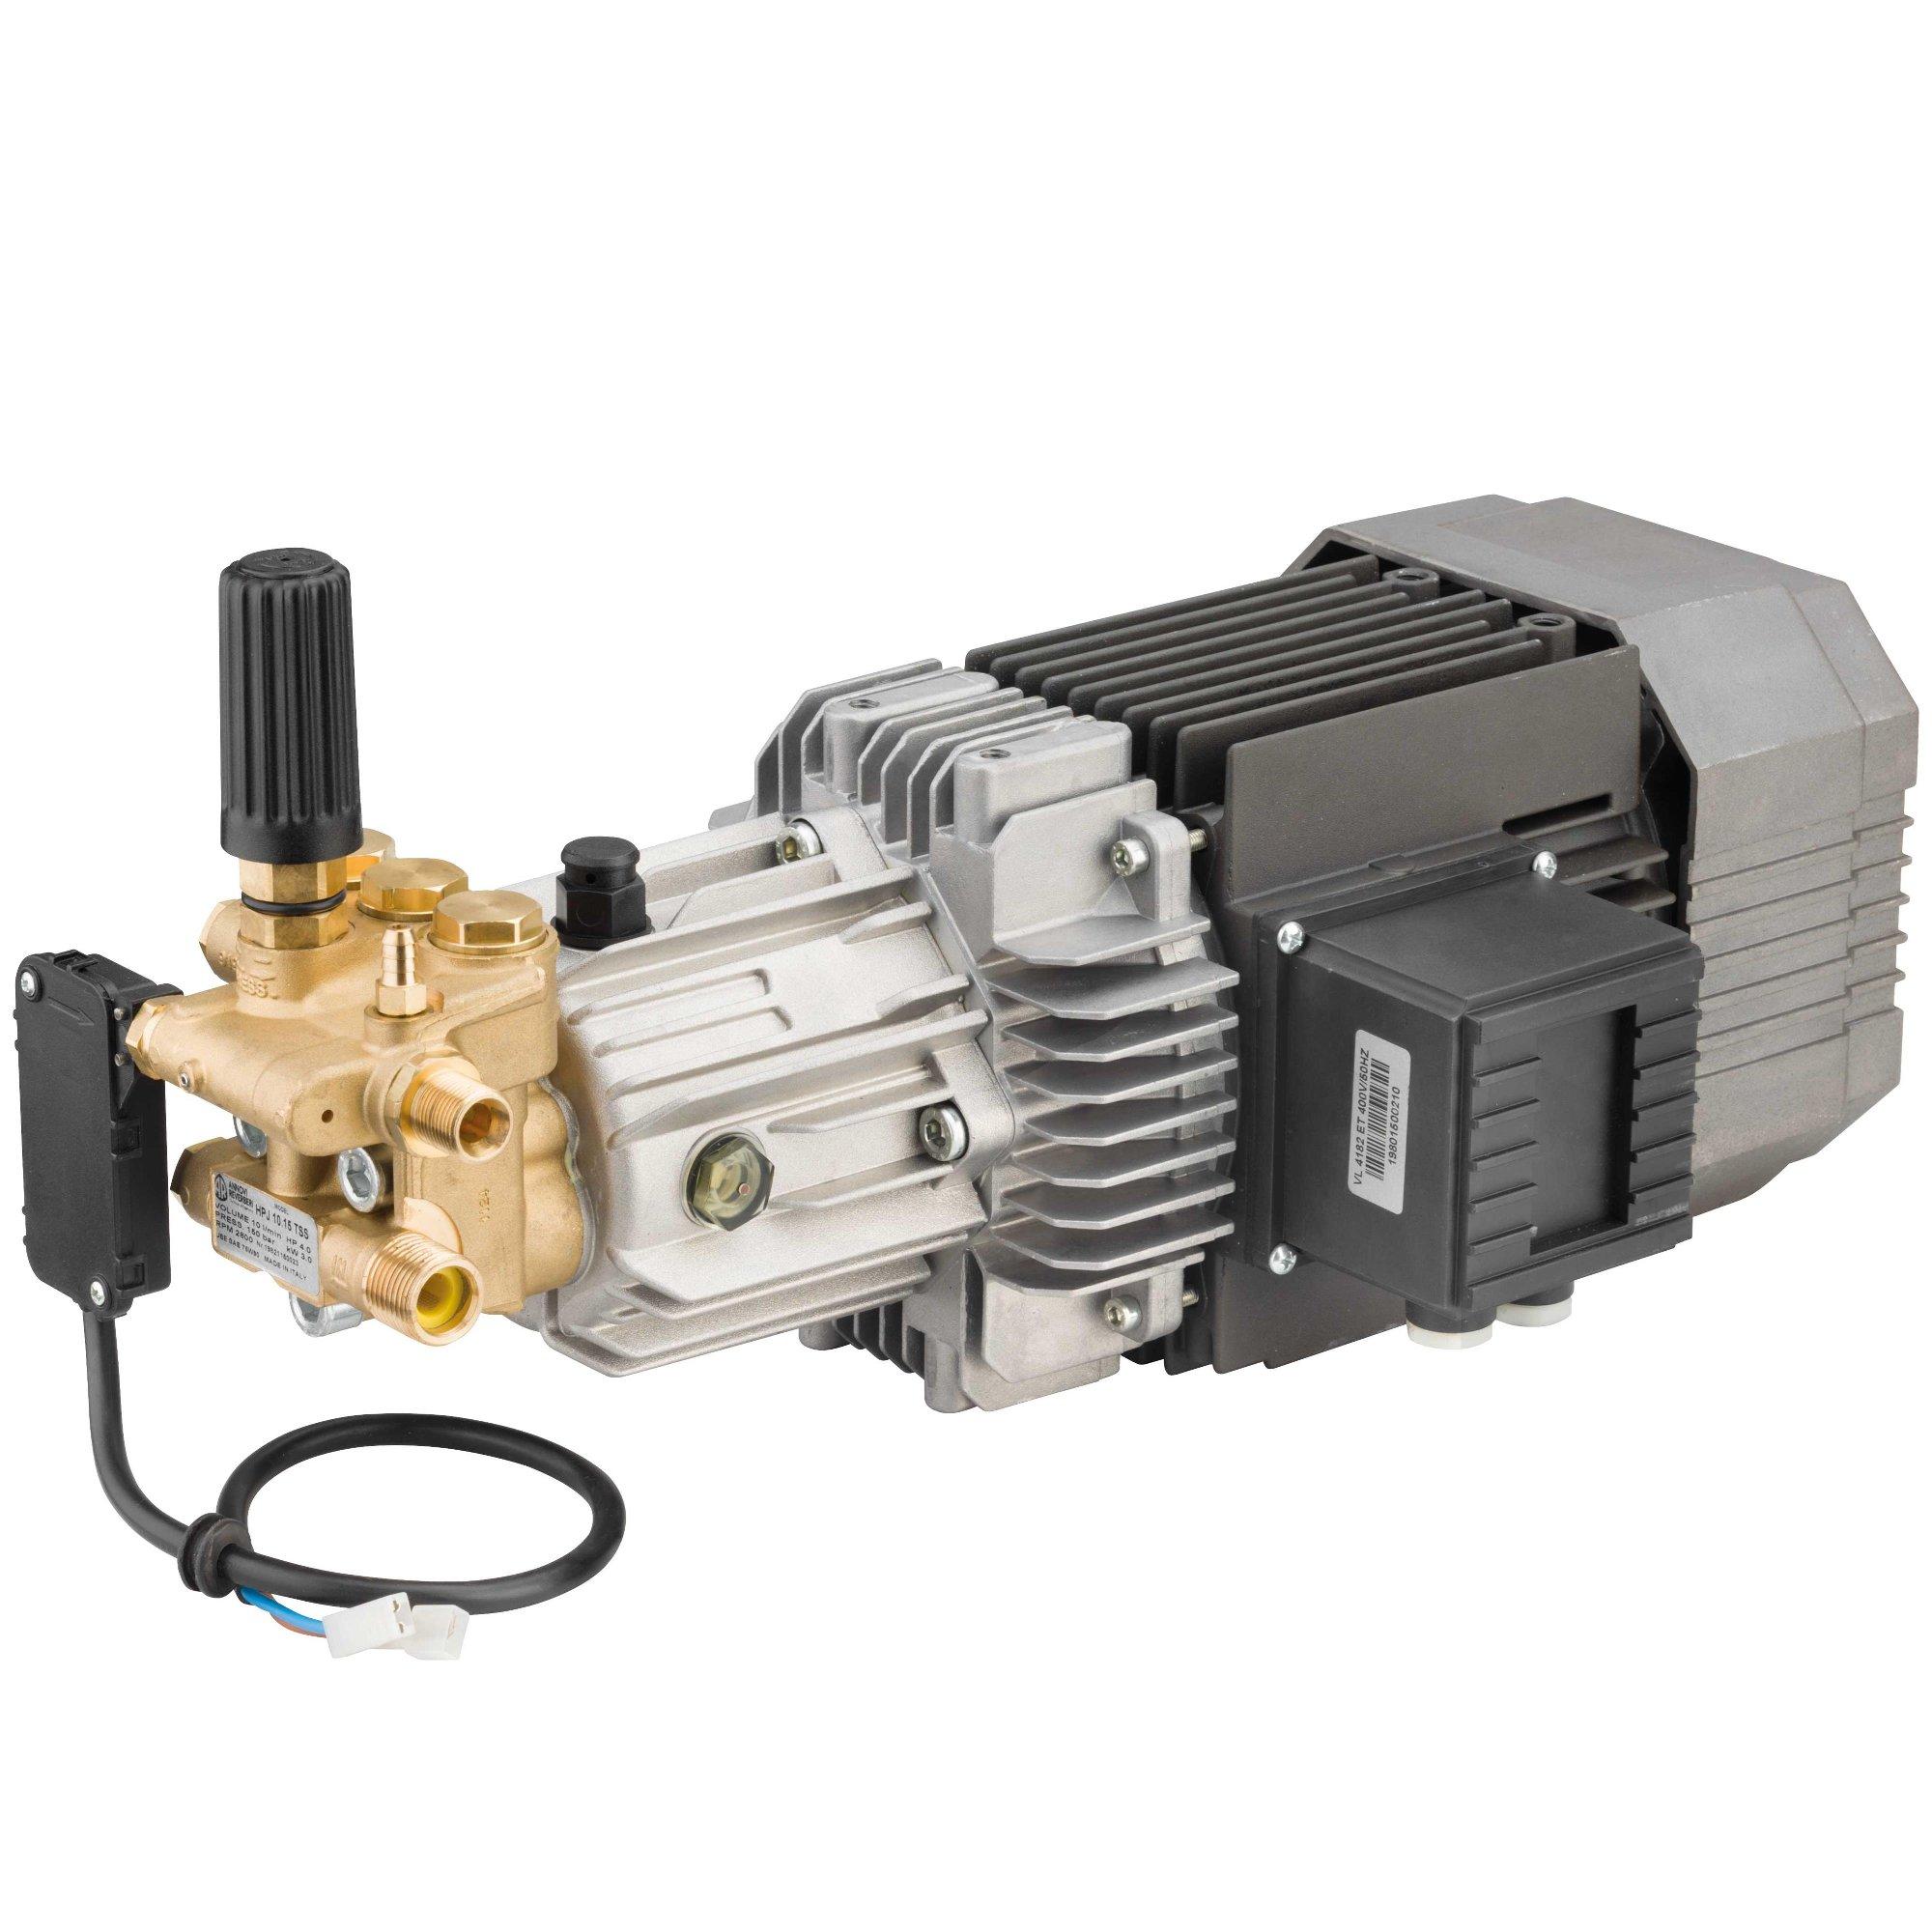 Annovi Reverberi Motorpumpe HPJ 11.11 11L 110B 2800 UPM Motorpumpe HPJ11.11 11L 110B 2800 UPM